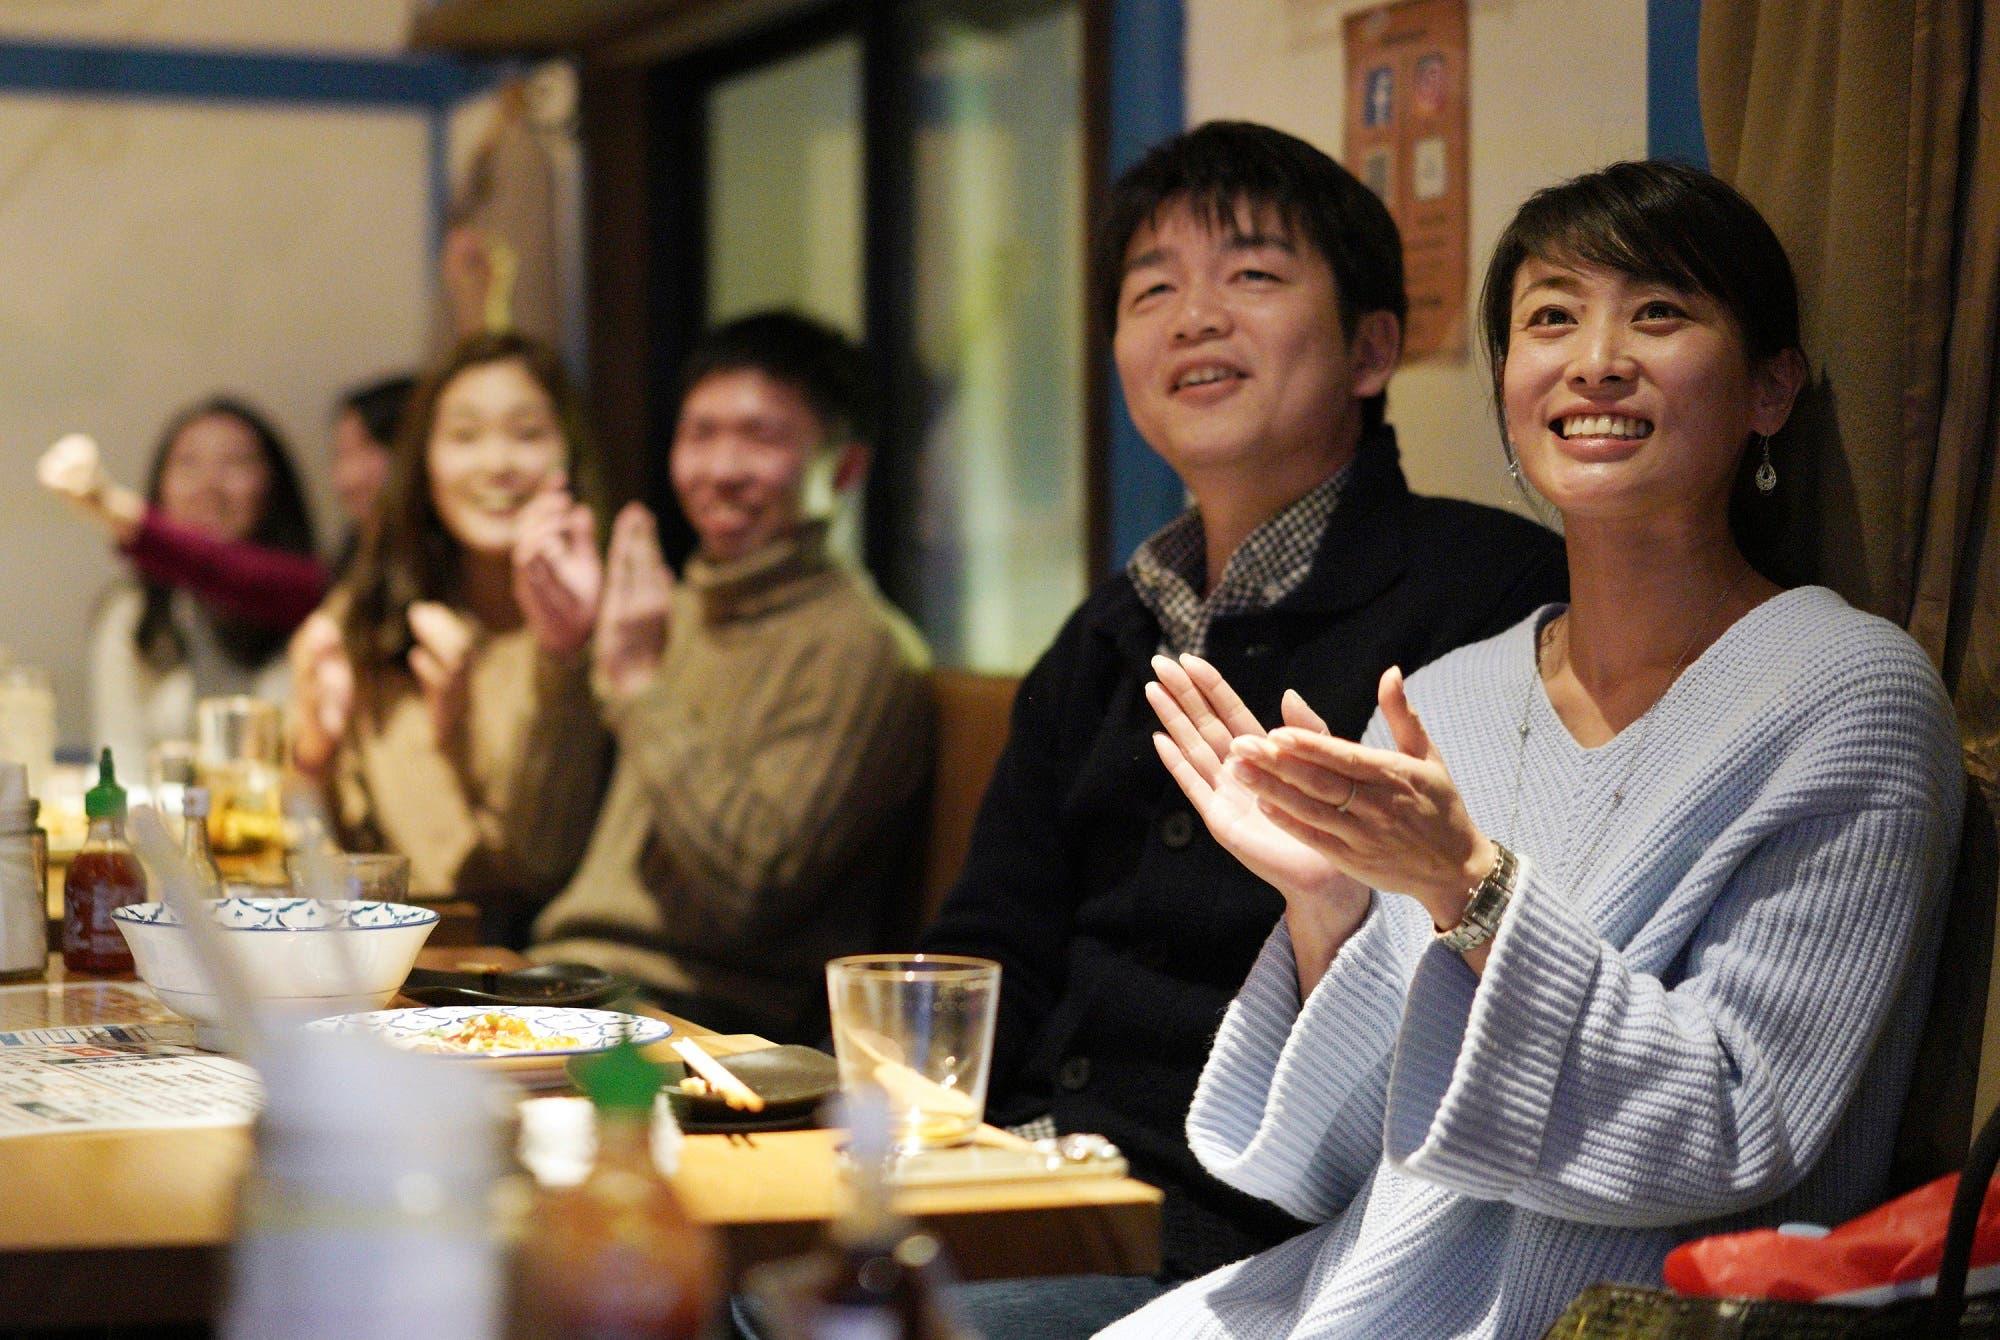 Fans at a restaurant in Tokyo watch as Japan's Naomi Osaka wins against Czech Republic's Petra Kvitova at the Australian Open. (AP)